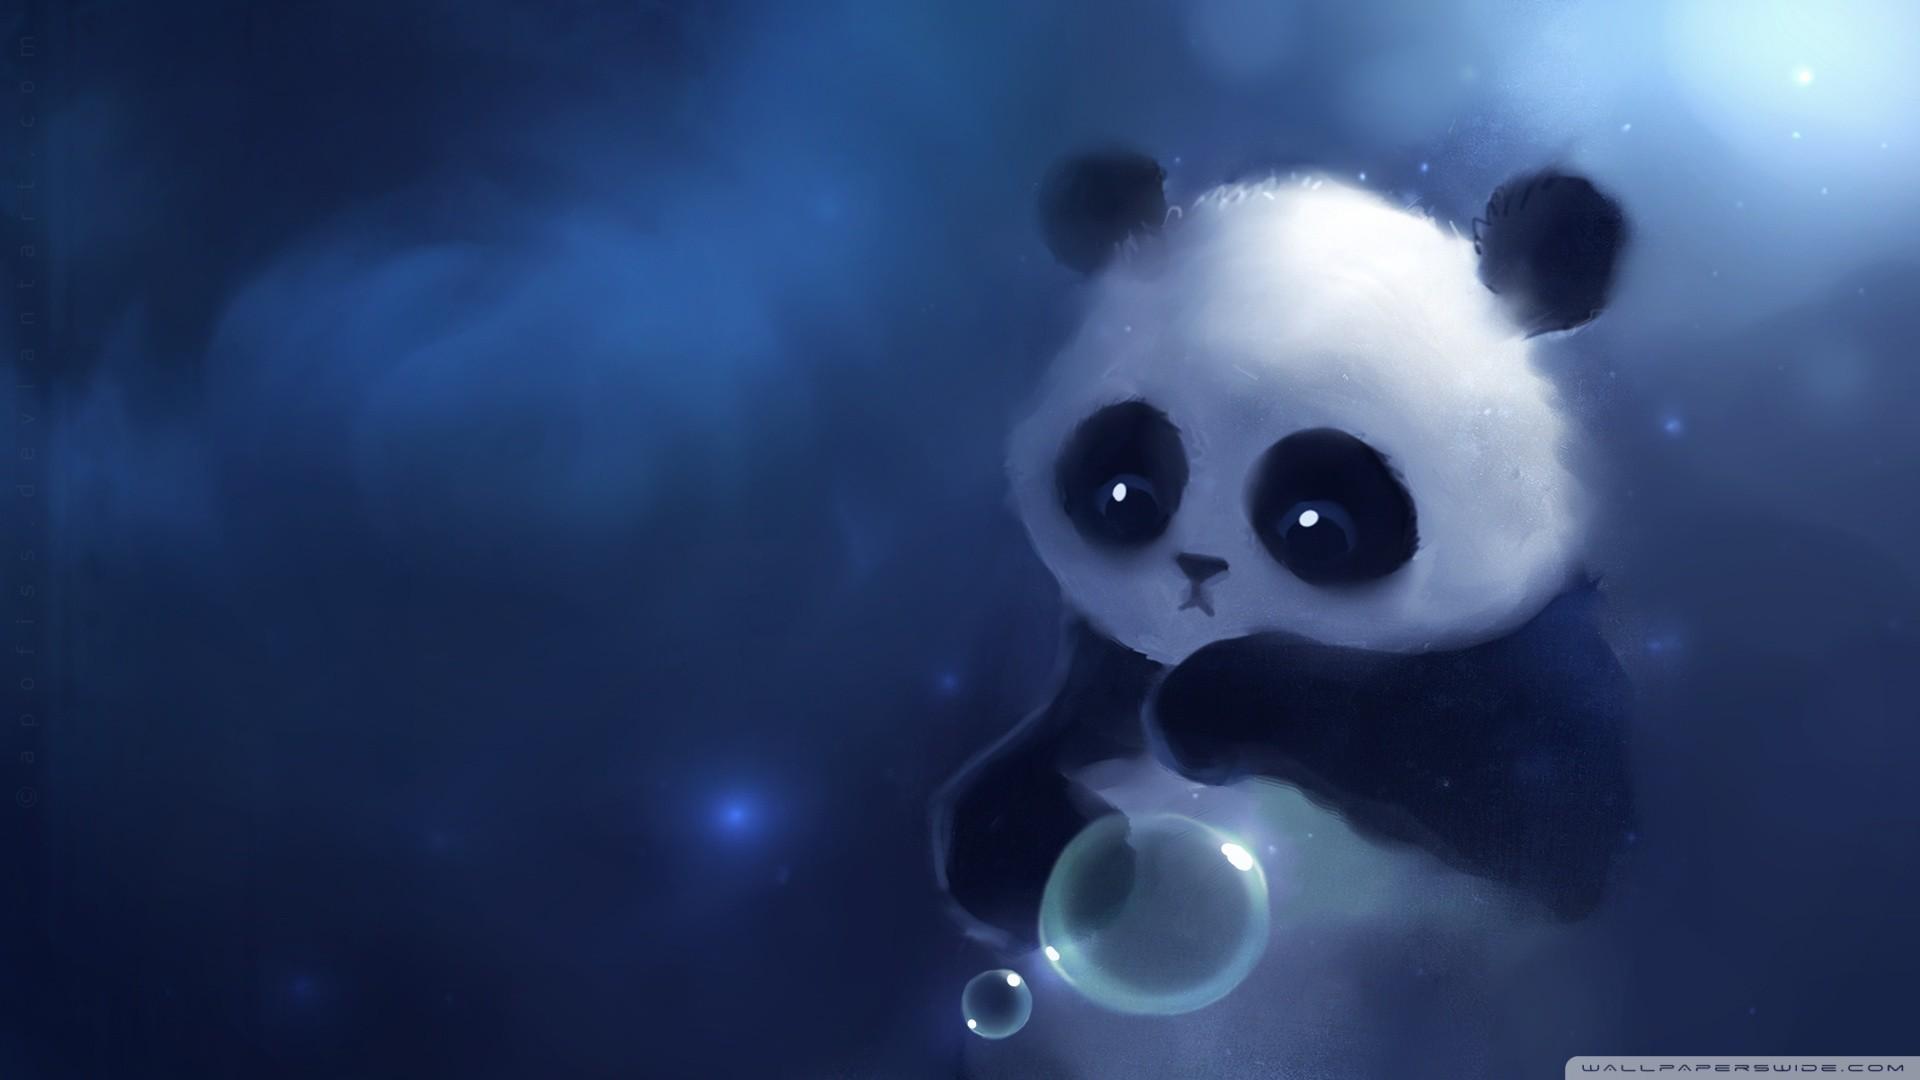 Sad Panda Painting HD Wide Wallpaper for Widescreen